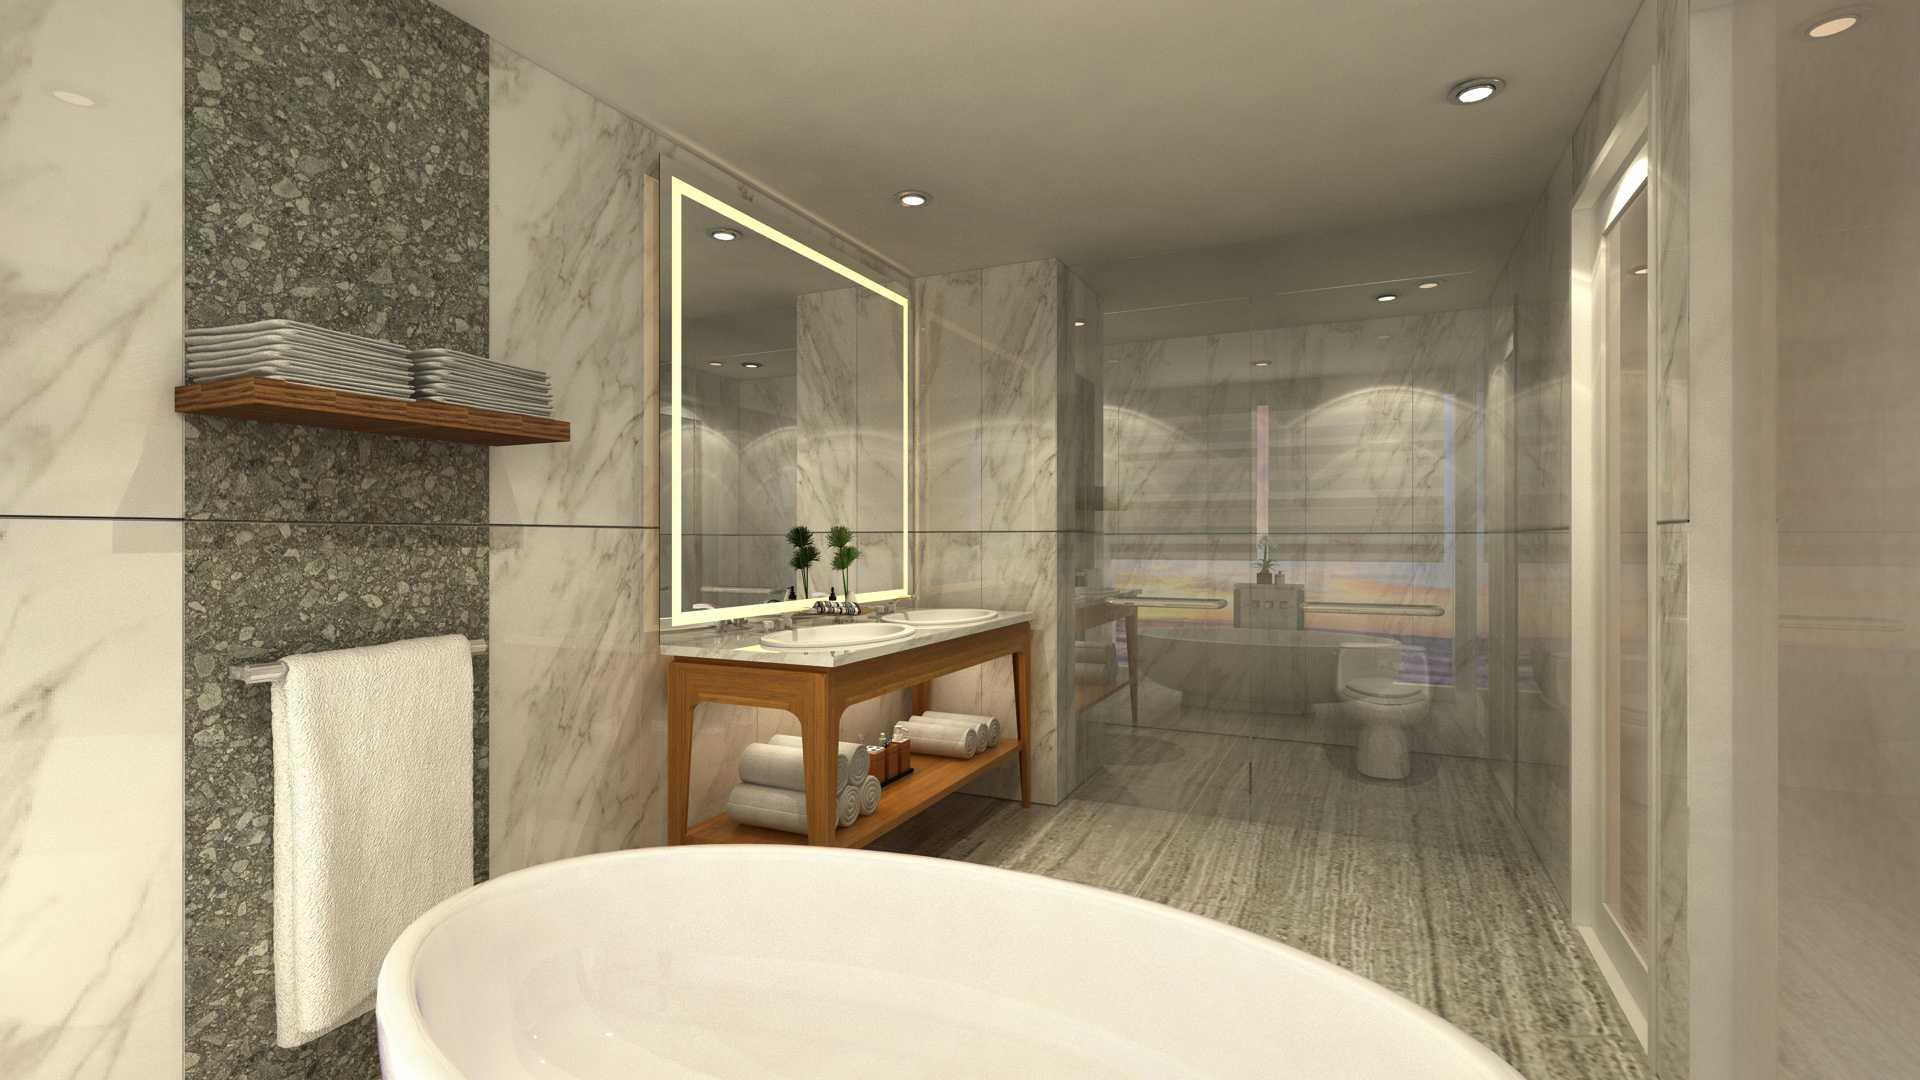 Vin•da•te Hotel Canggu Beach Bali - Indonesia Bali - Indonesia Bathroom Kontemporer  17584